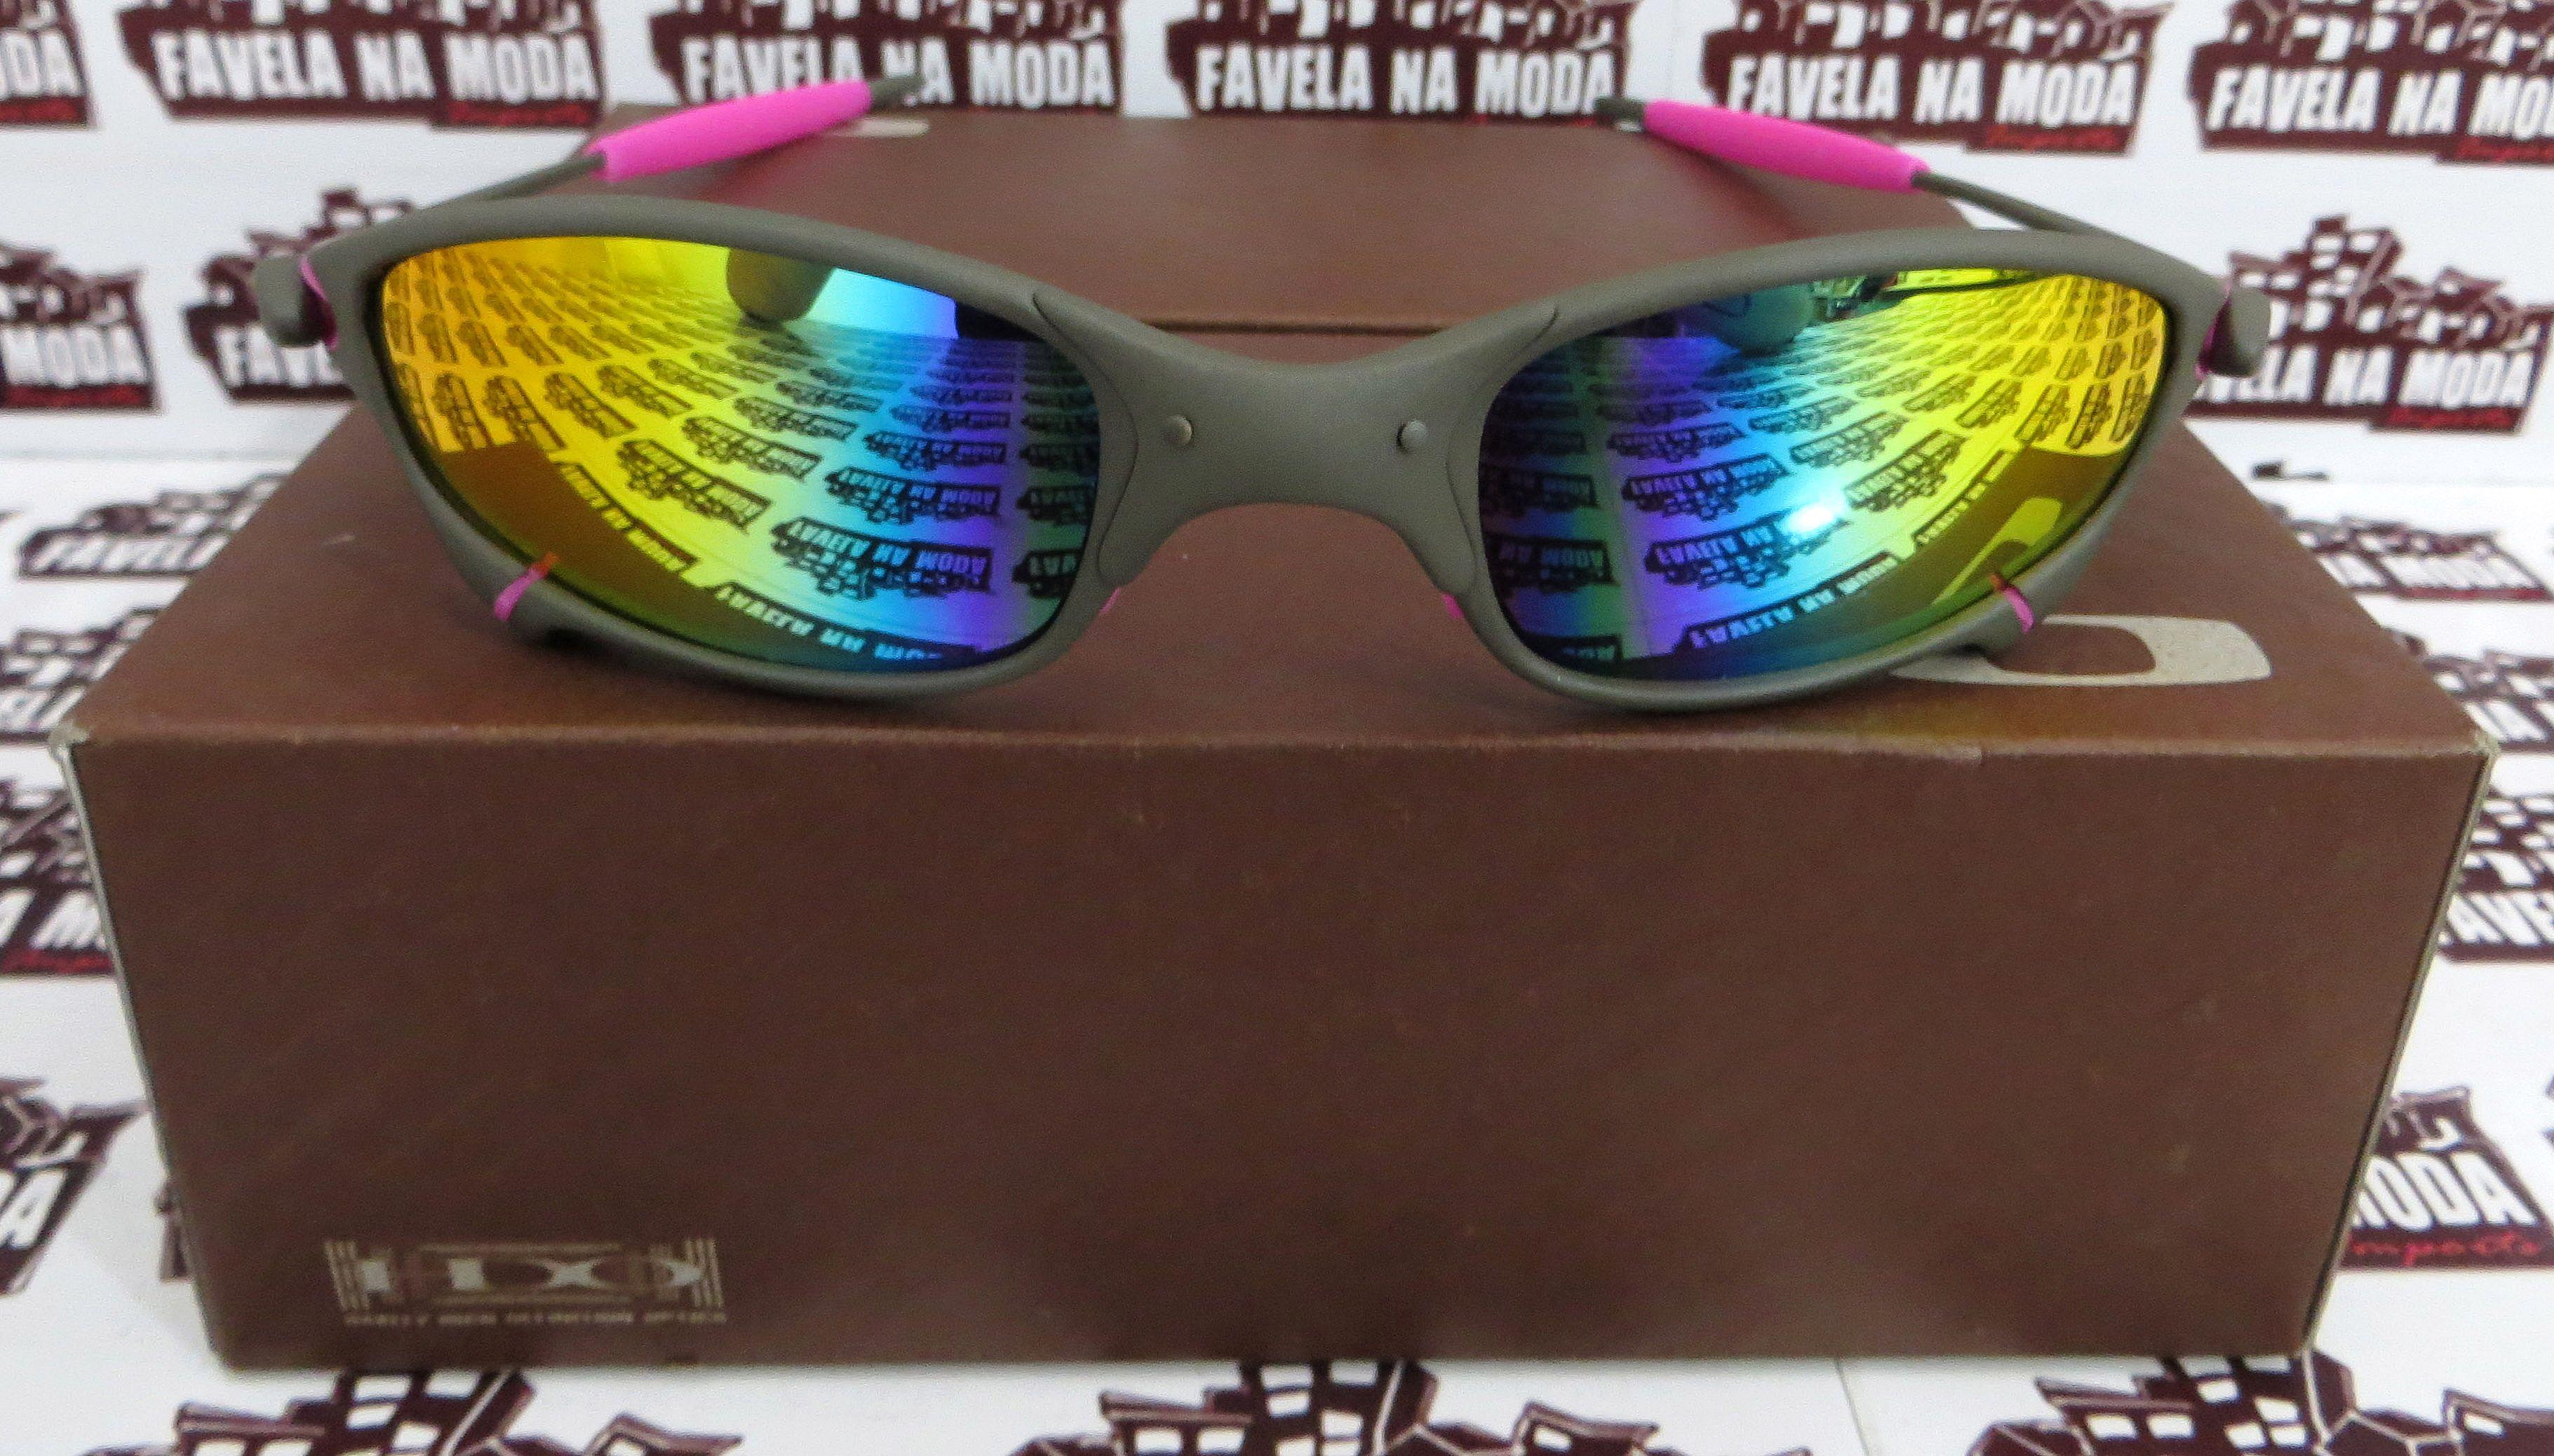 4ac3717d05a74 Óculos Oakley Juliet - X-Metal   Arco Íris   Borrachas Rosas